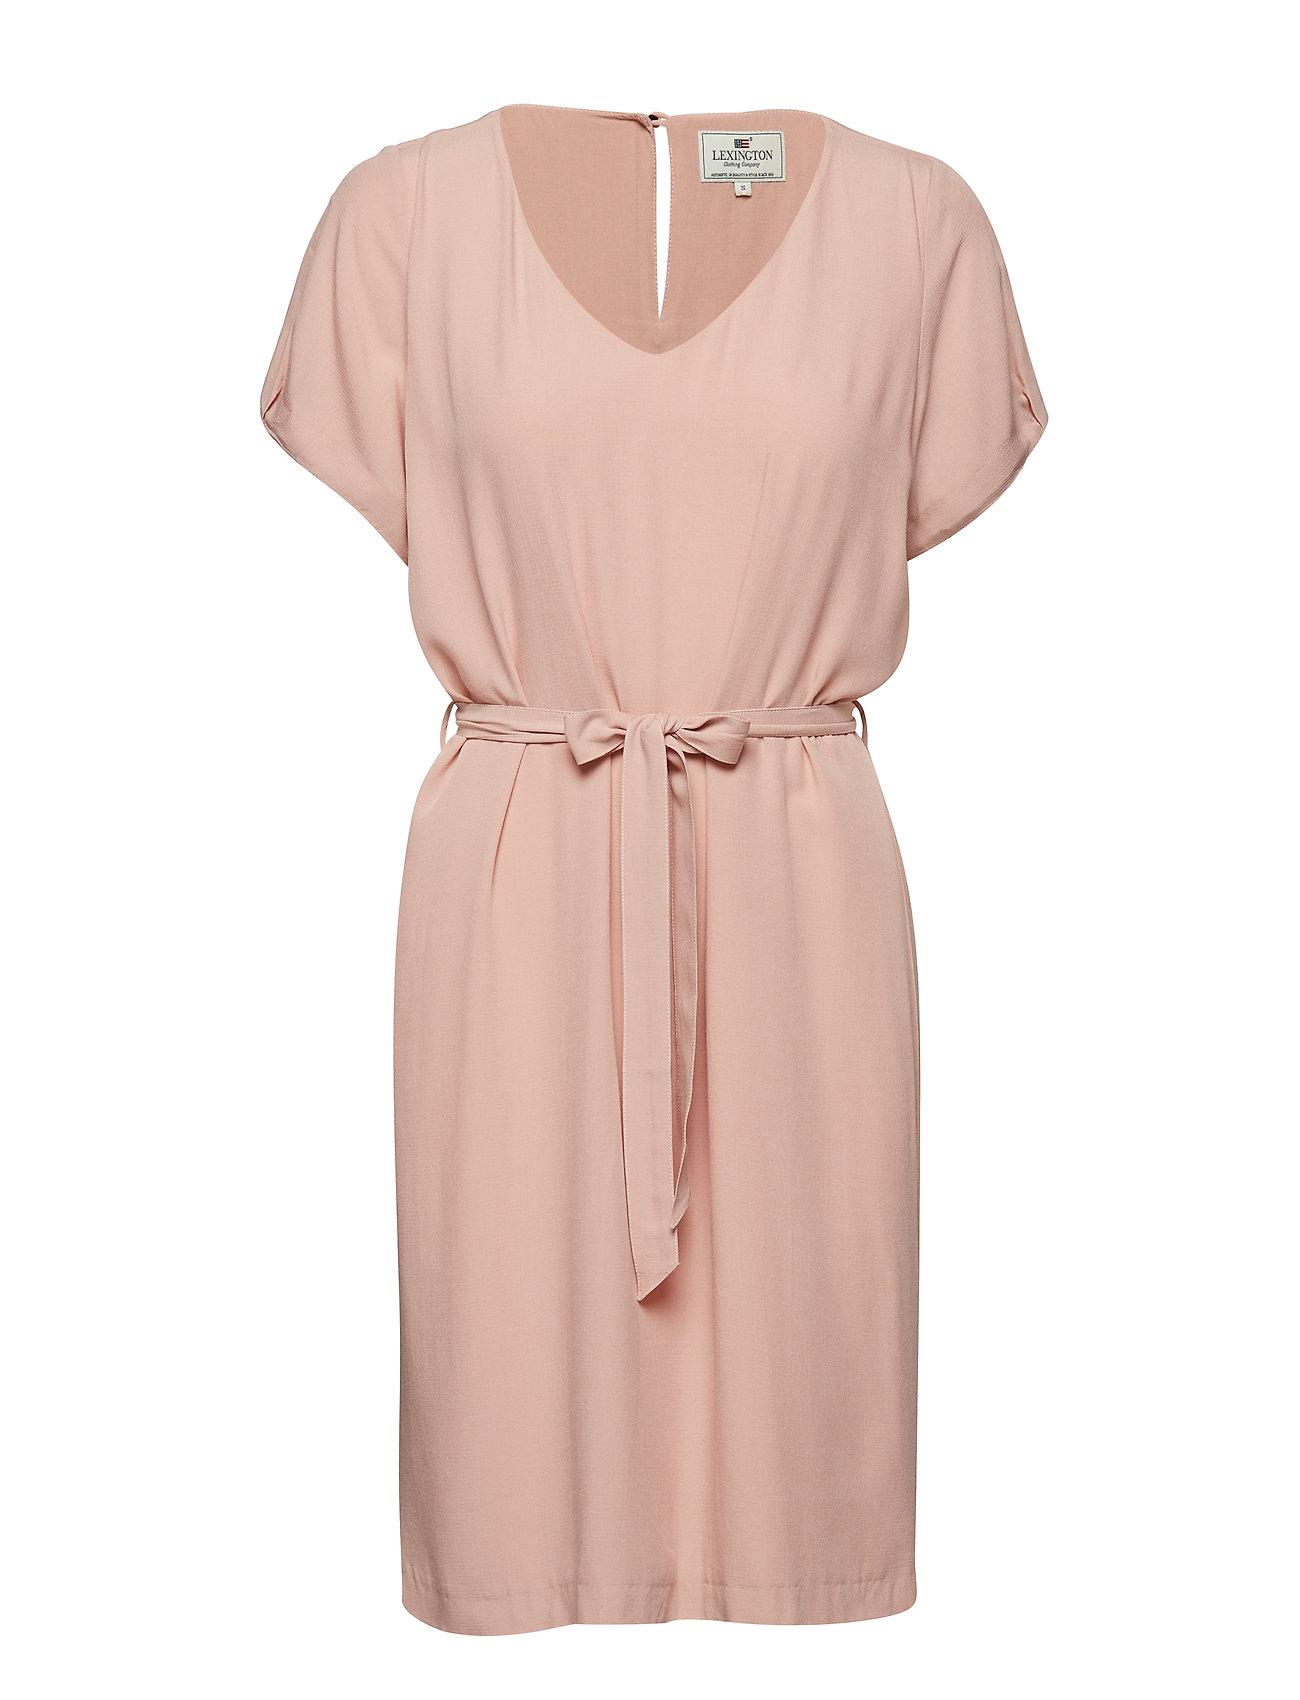 Lexington Clothing Kristina Solid Dress - MELLOW ROSE